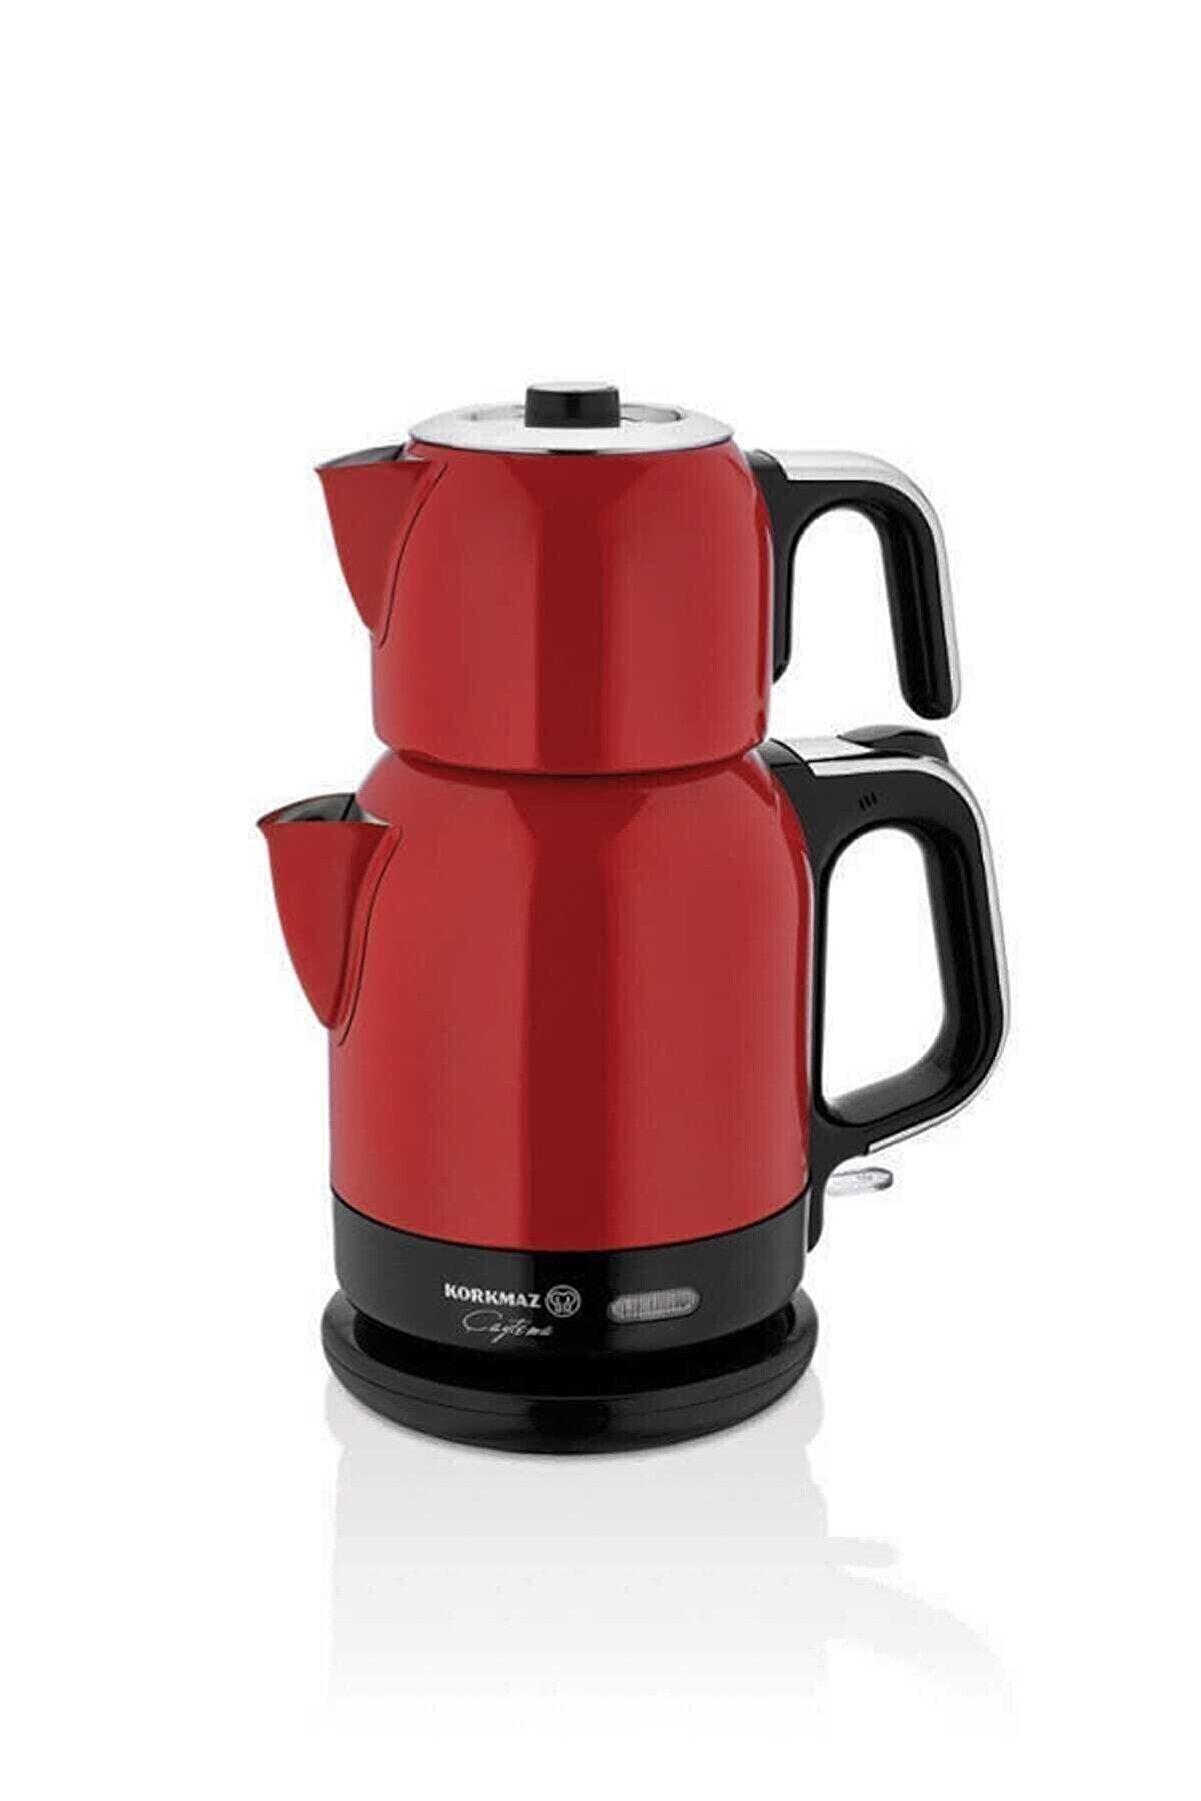 KORKMAZ Kırmızı Krom Çaytema Elektrikli Çaydanlık A331-05